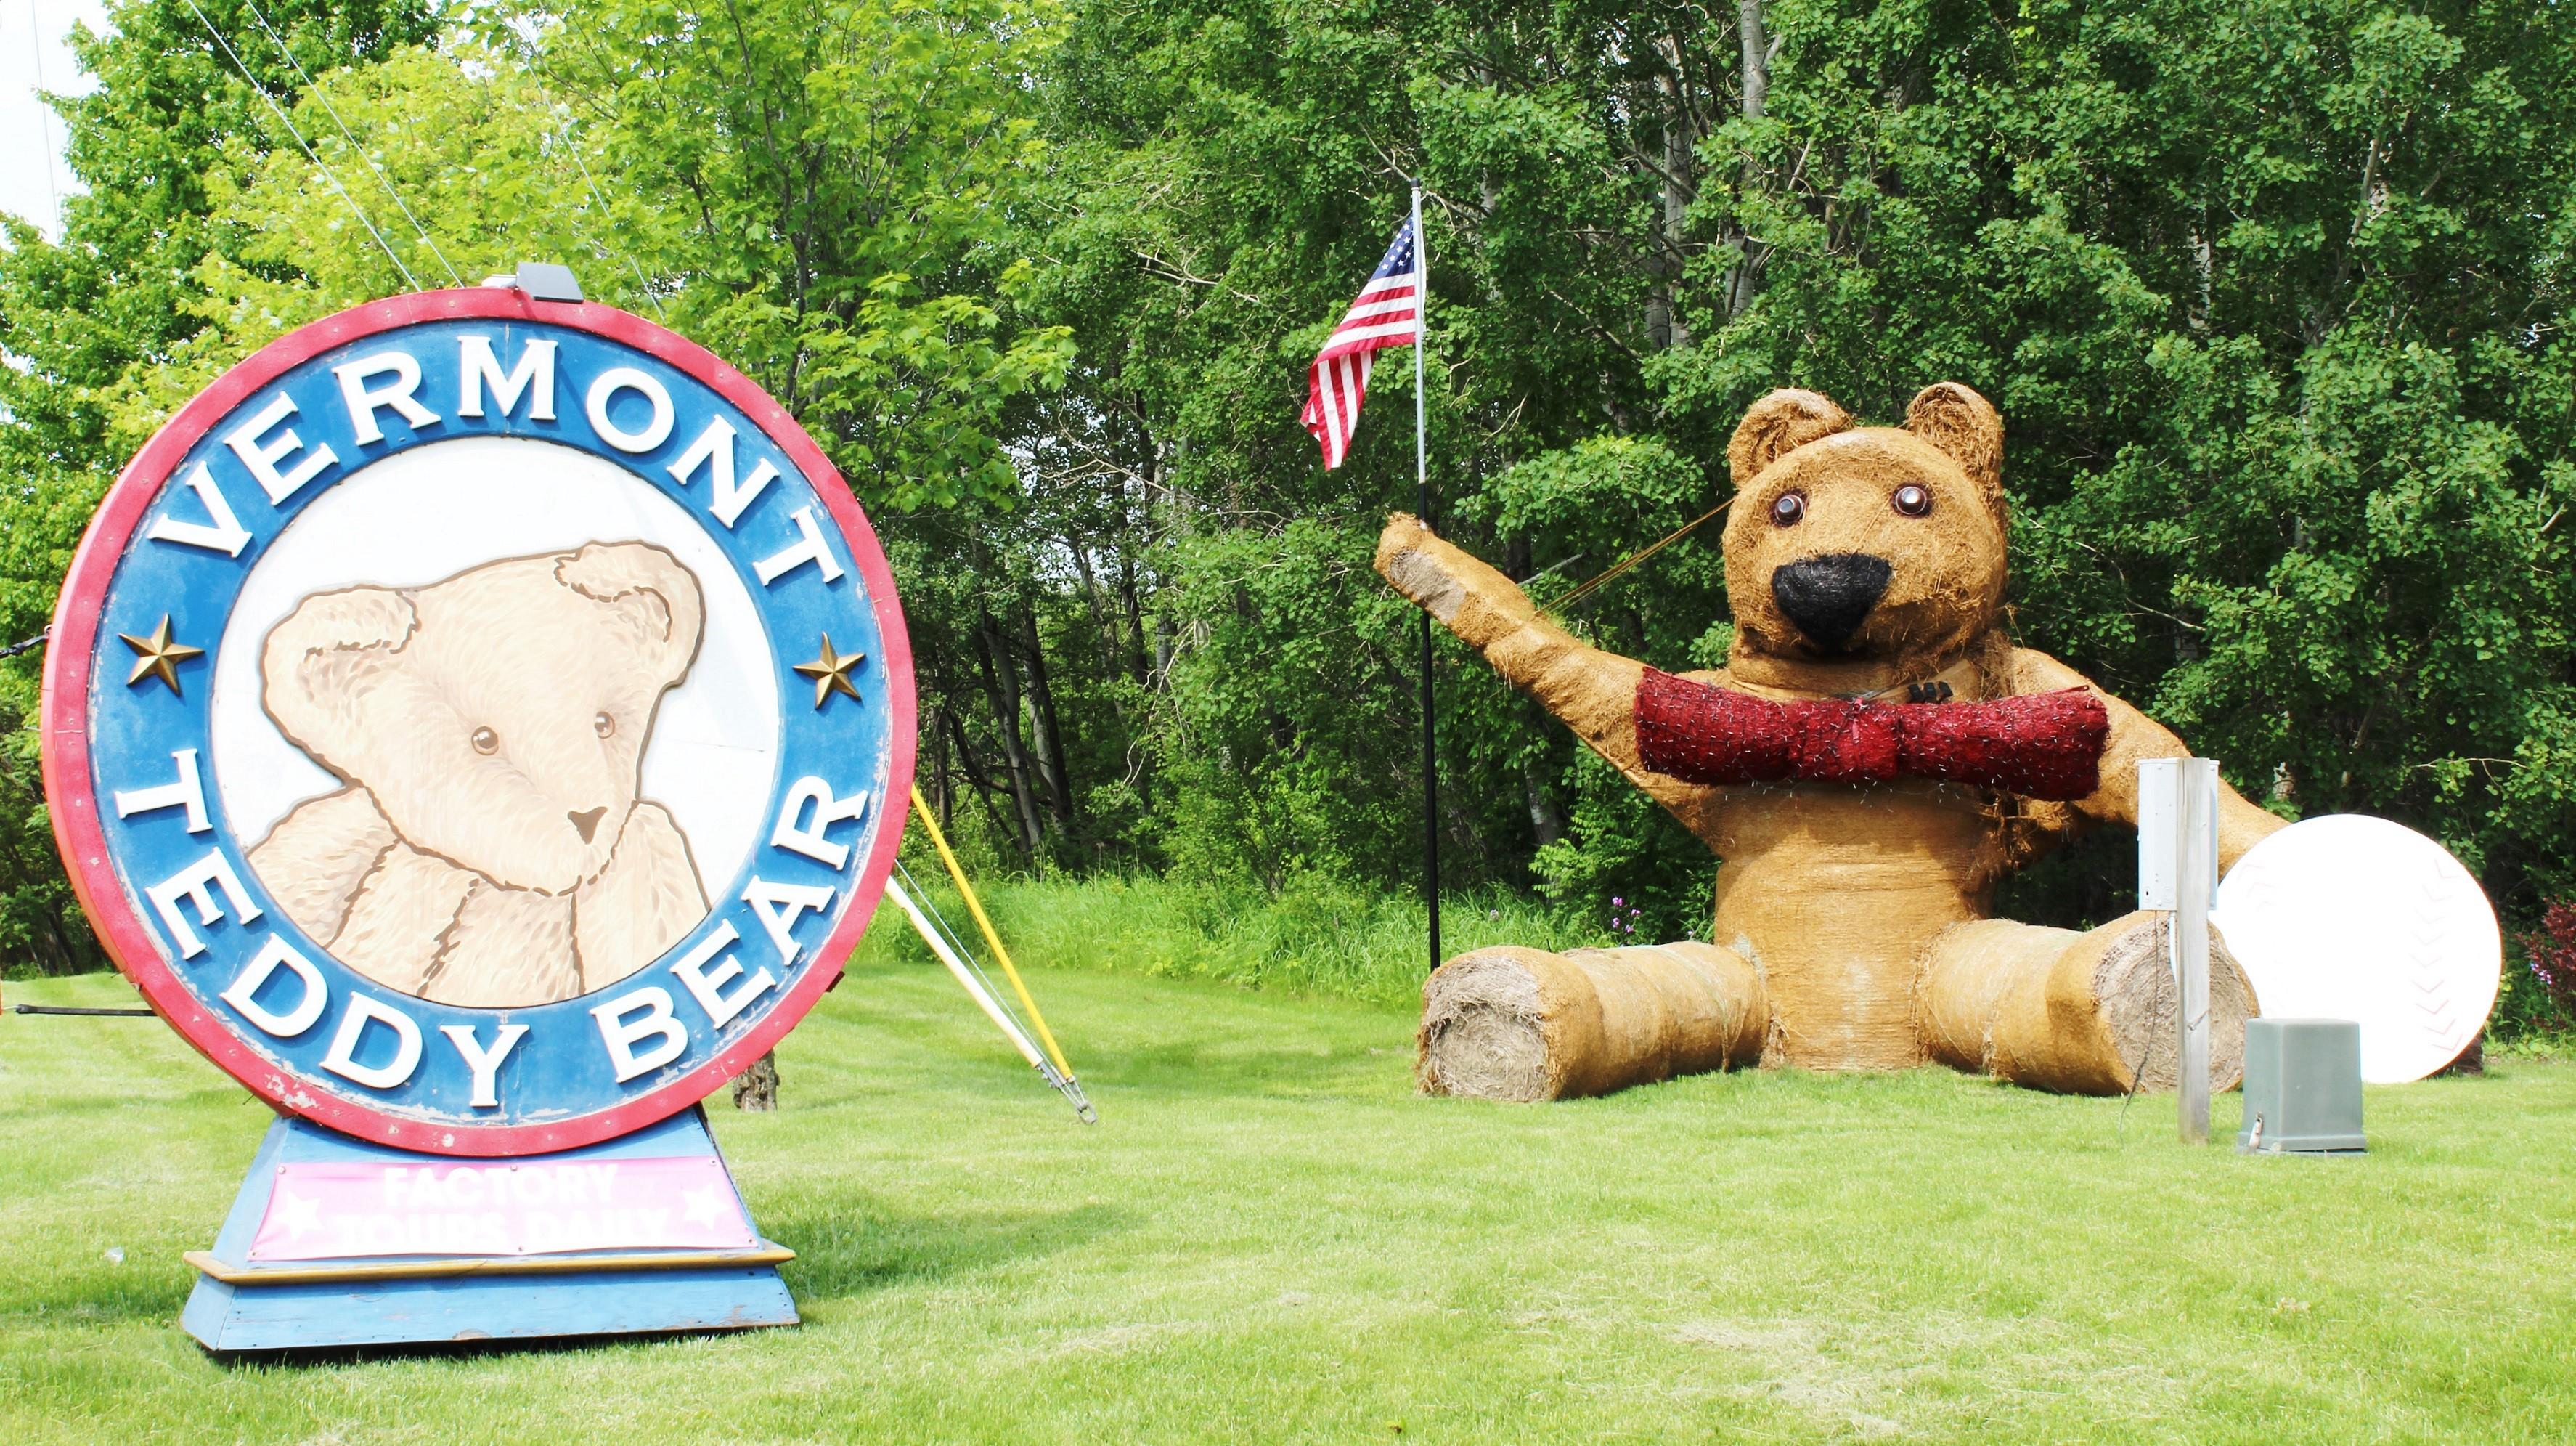 Vermont Teddy Bear Company near Heart of the Village Inn in Shelburne VT